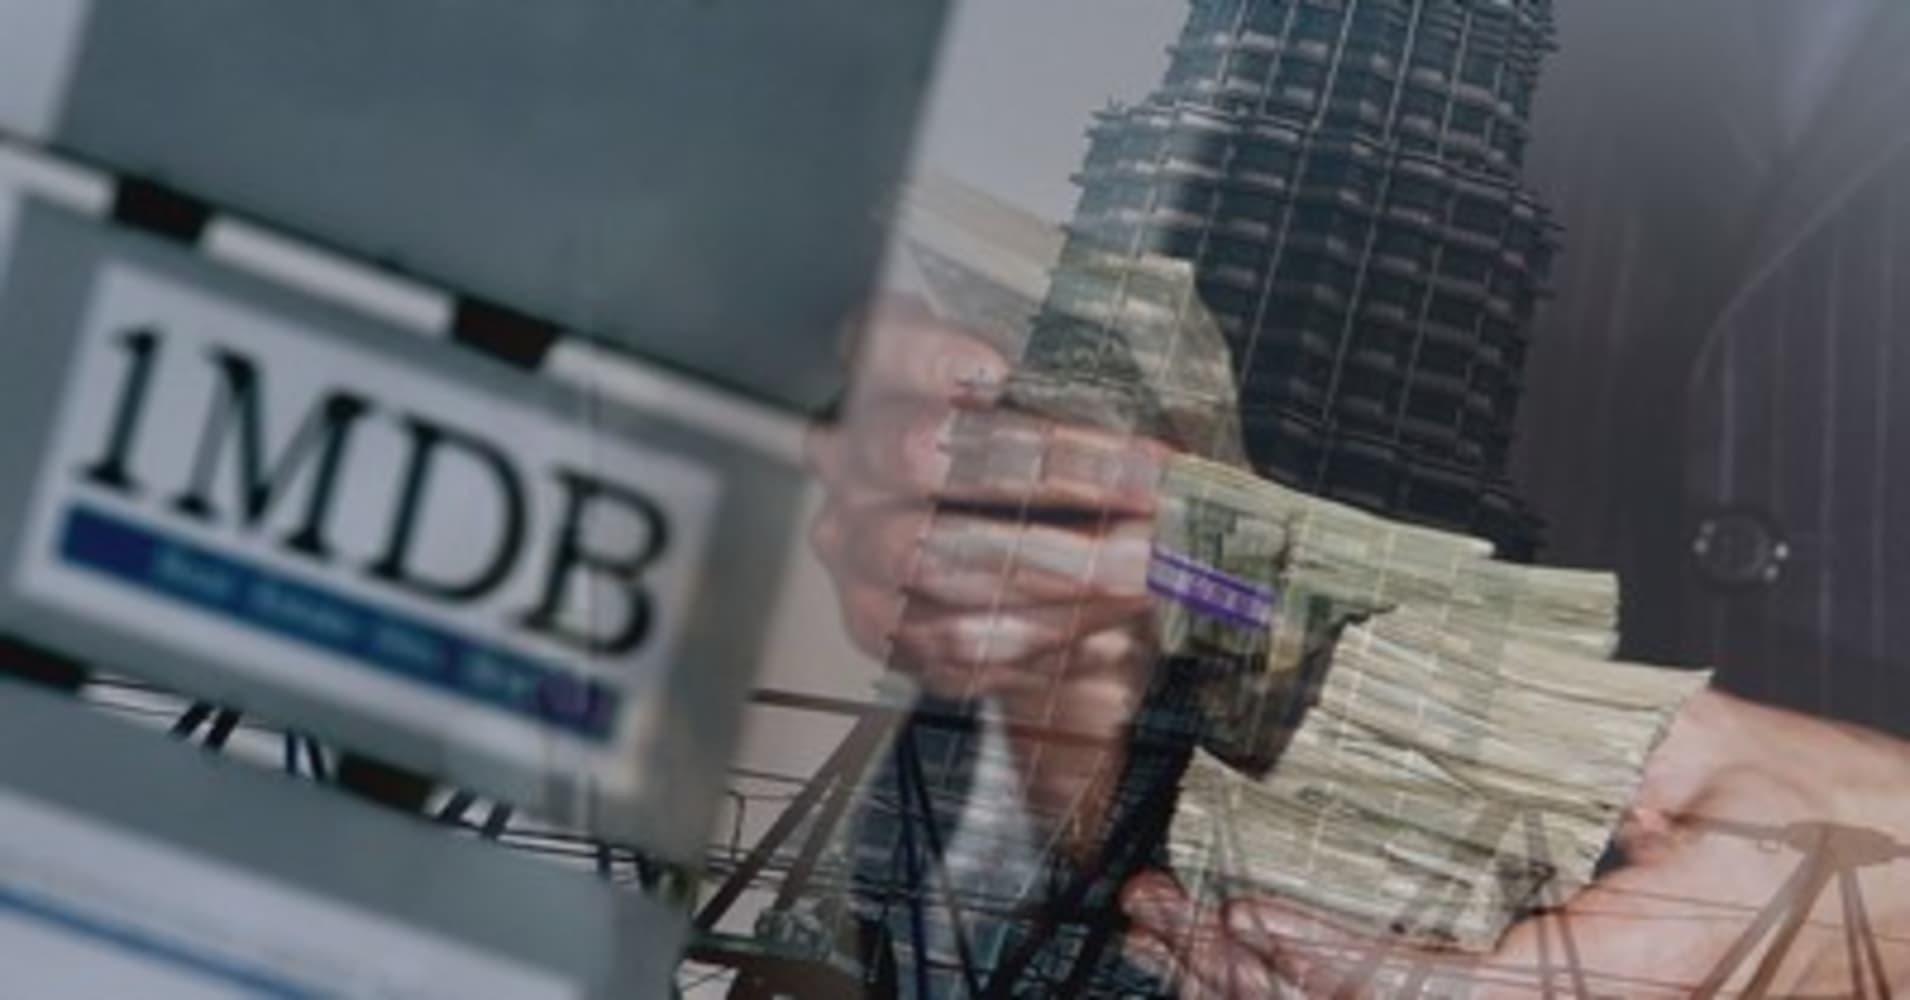 What happened to 1MDB's money?